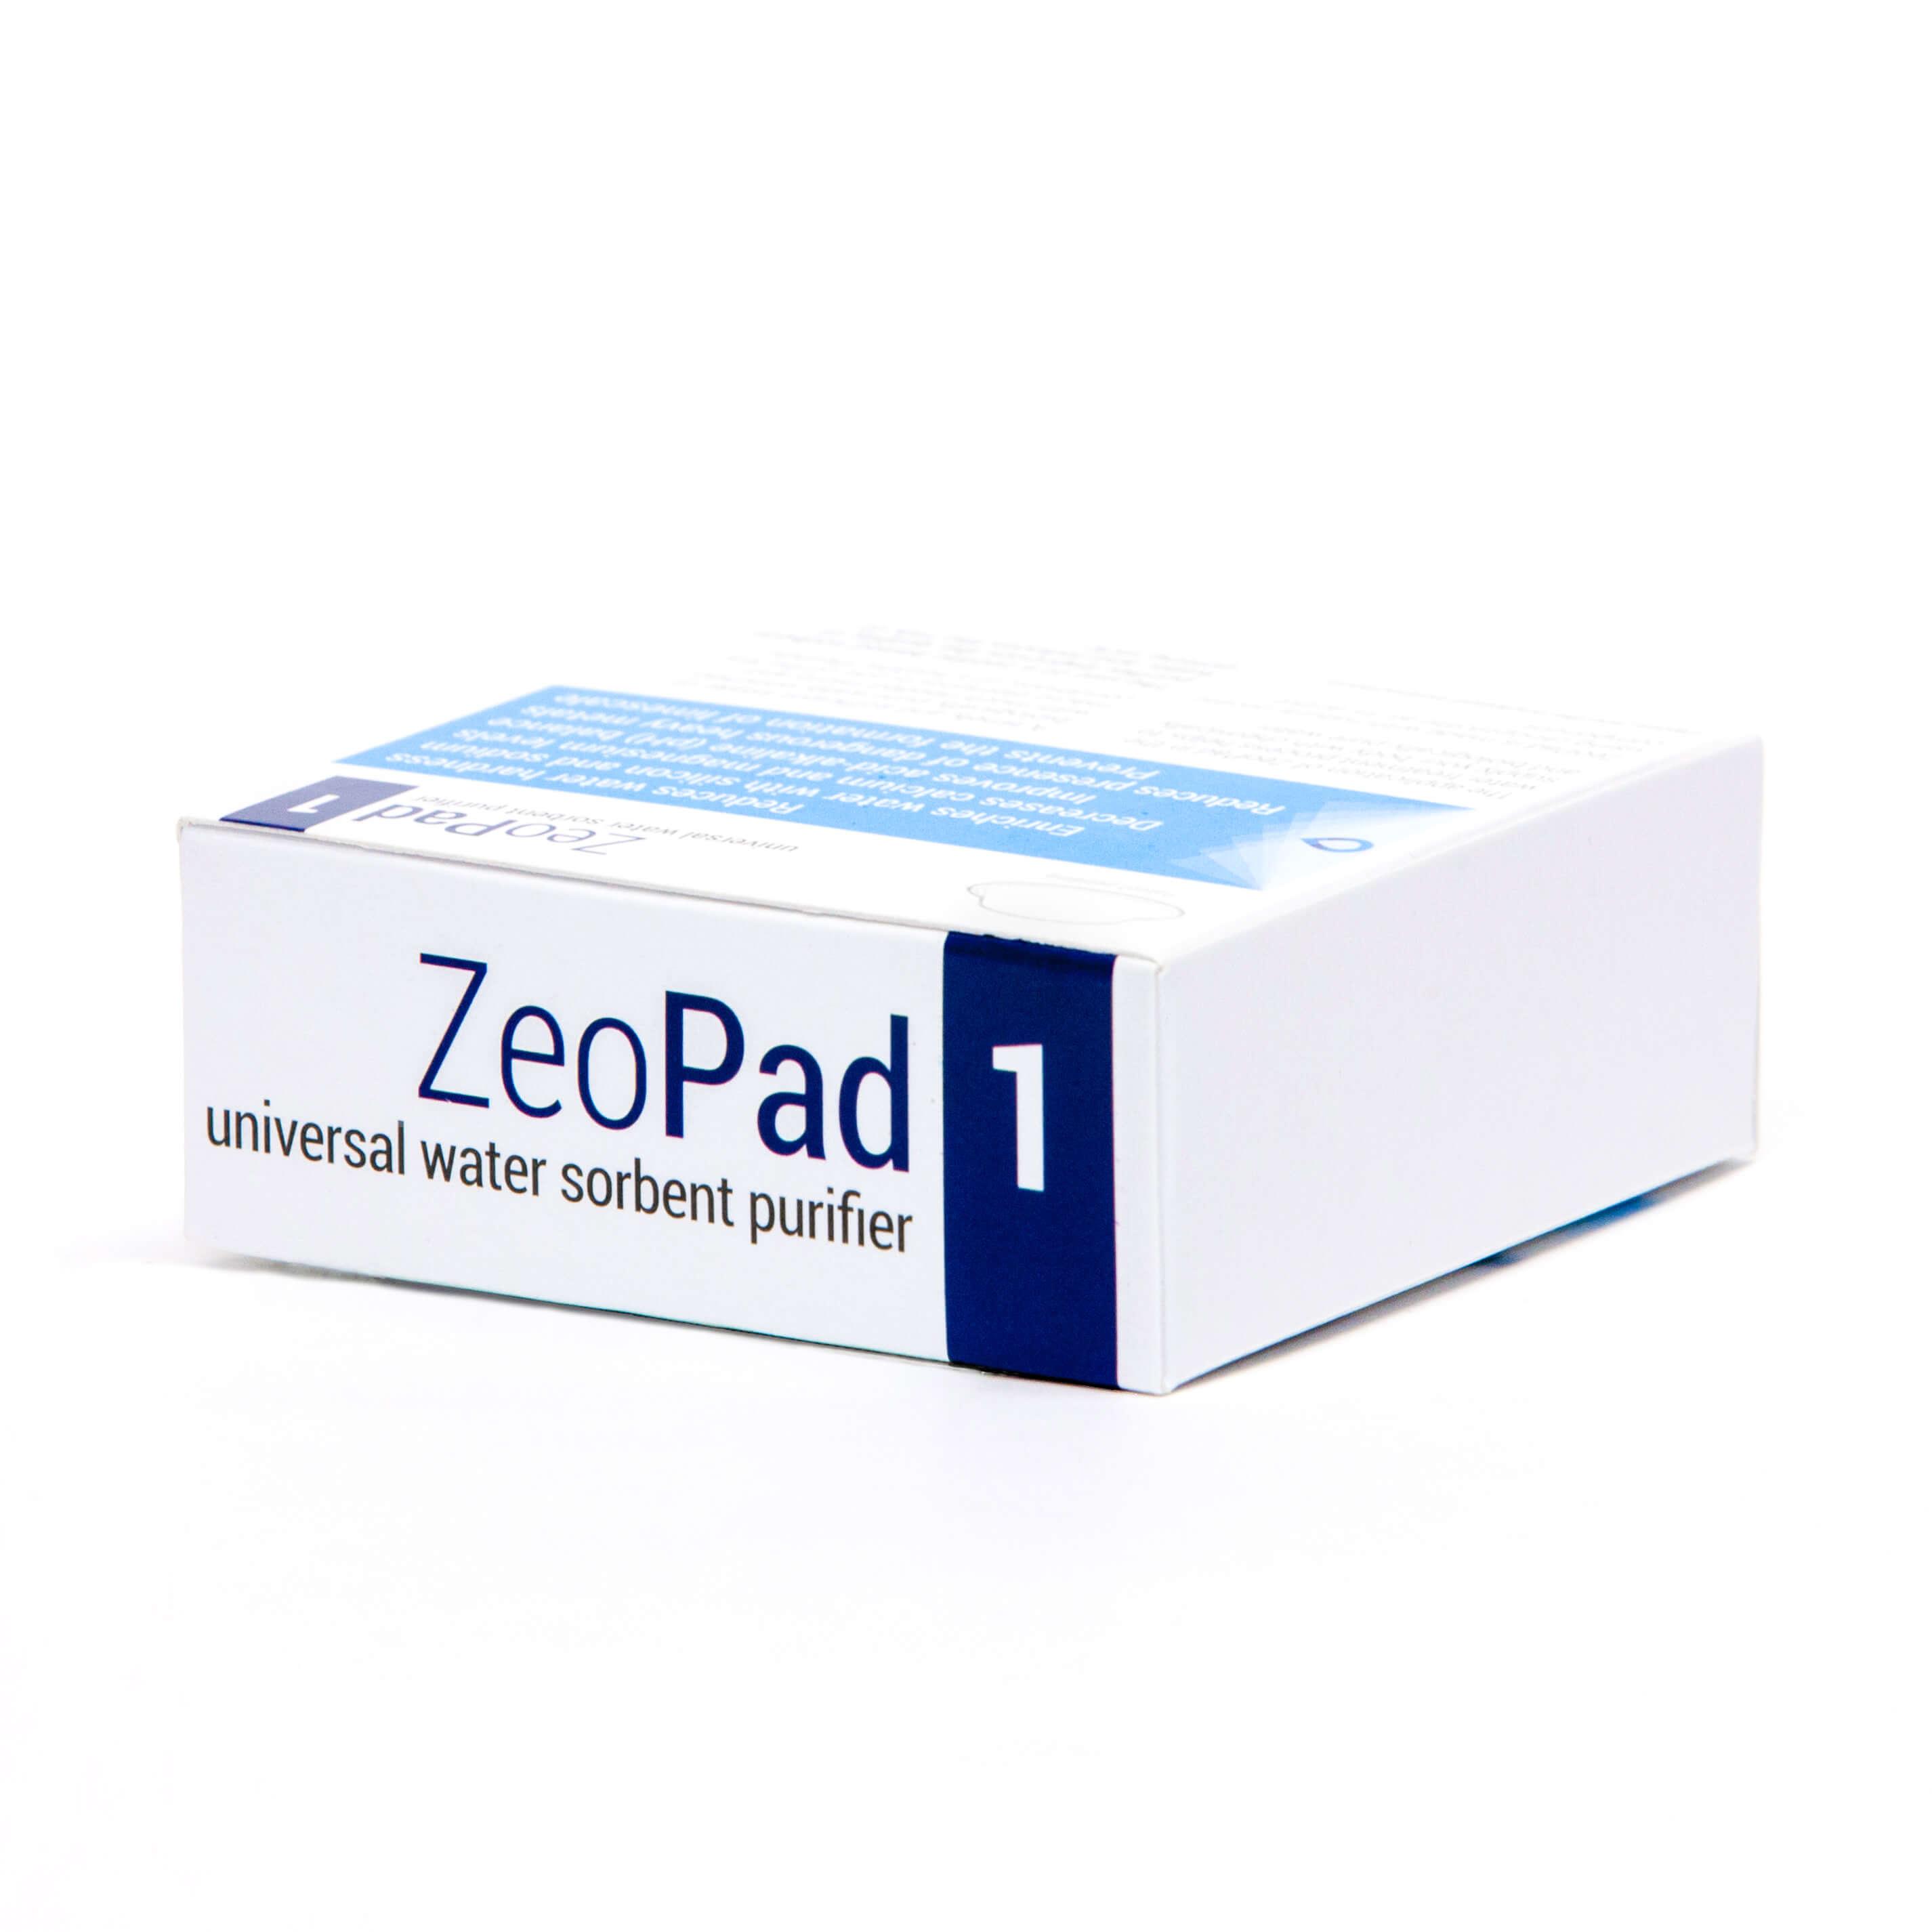 zeopad1